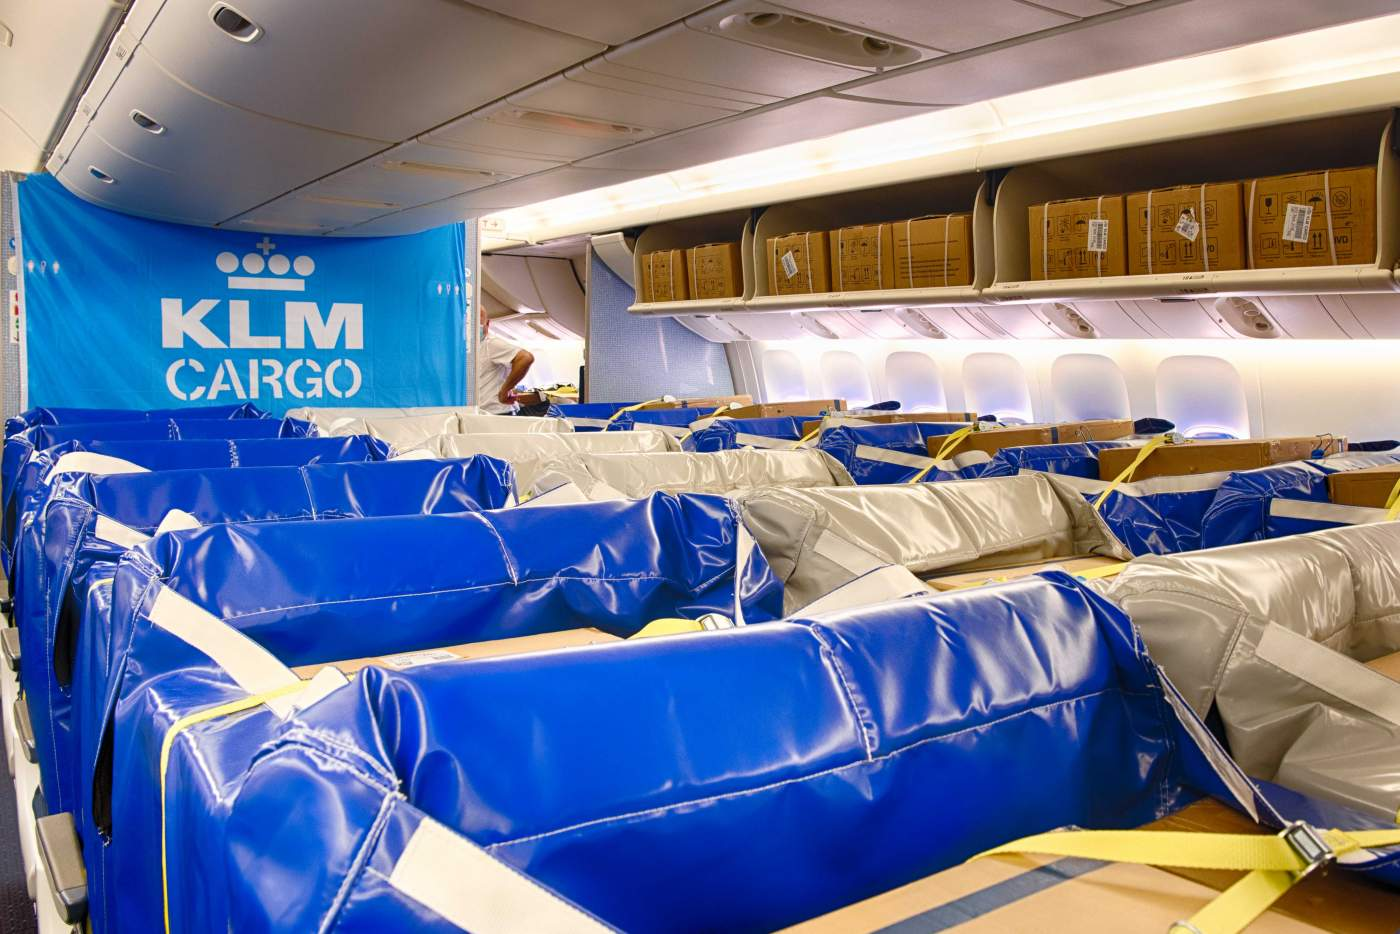 KLM Cargo Saco Cargas